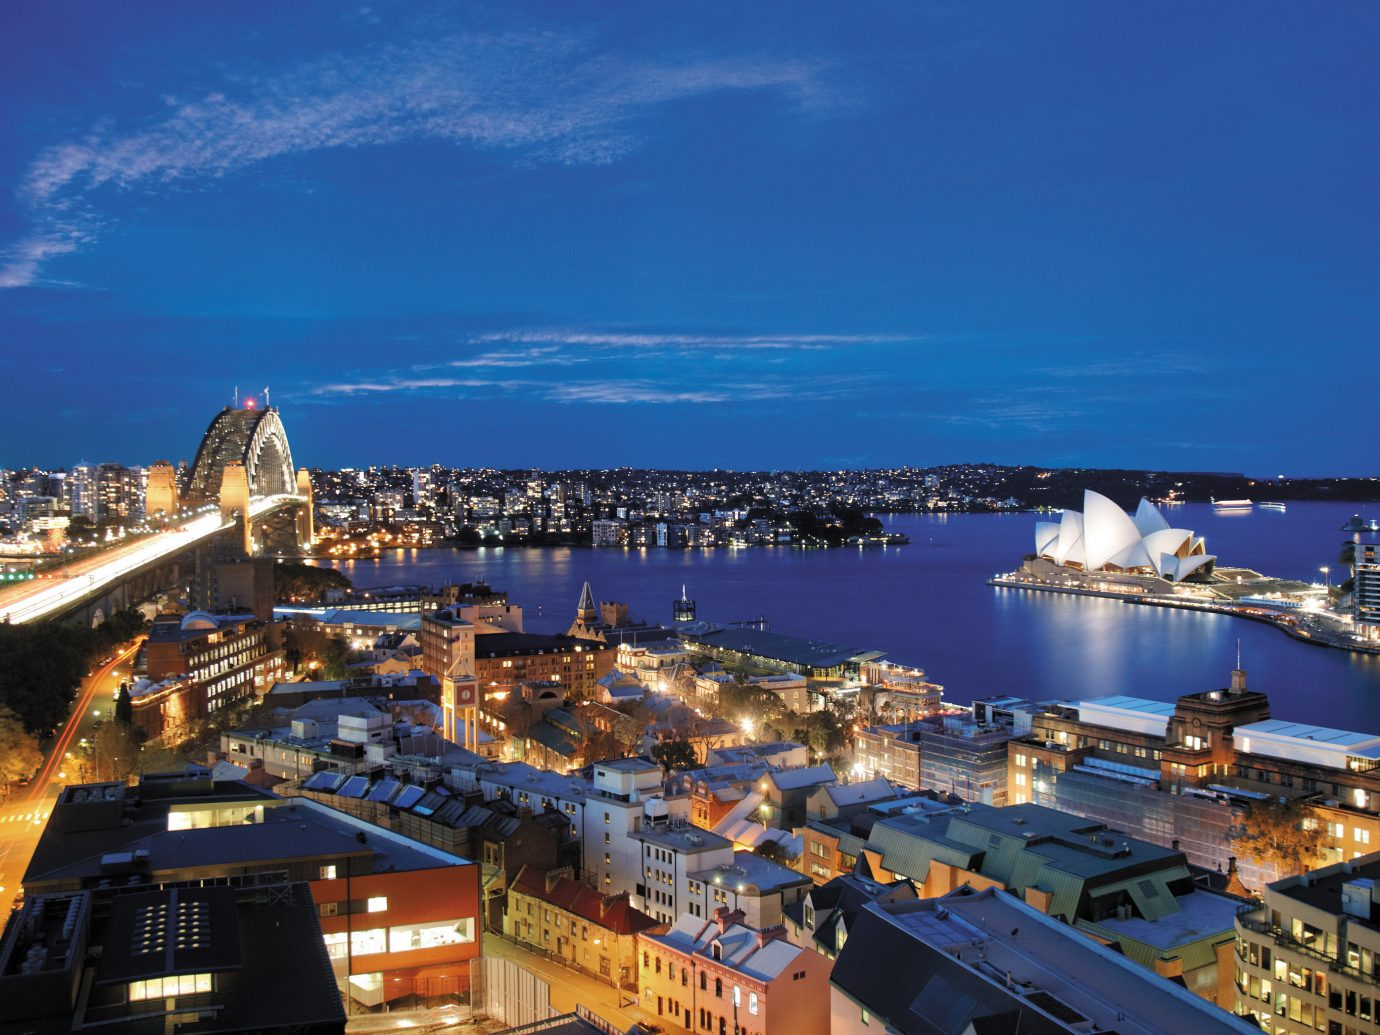 View from Altitude at Shangri-La, Sydney, Australia